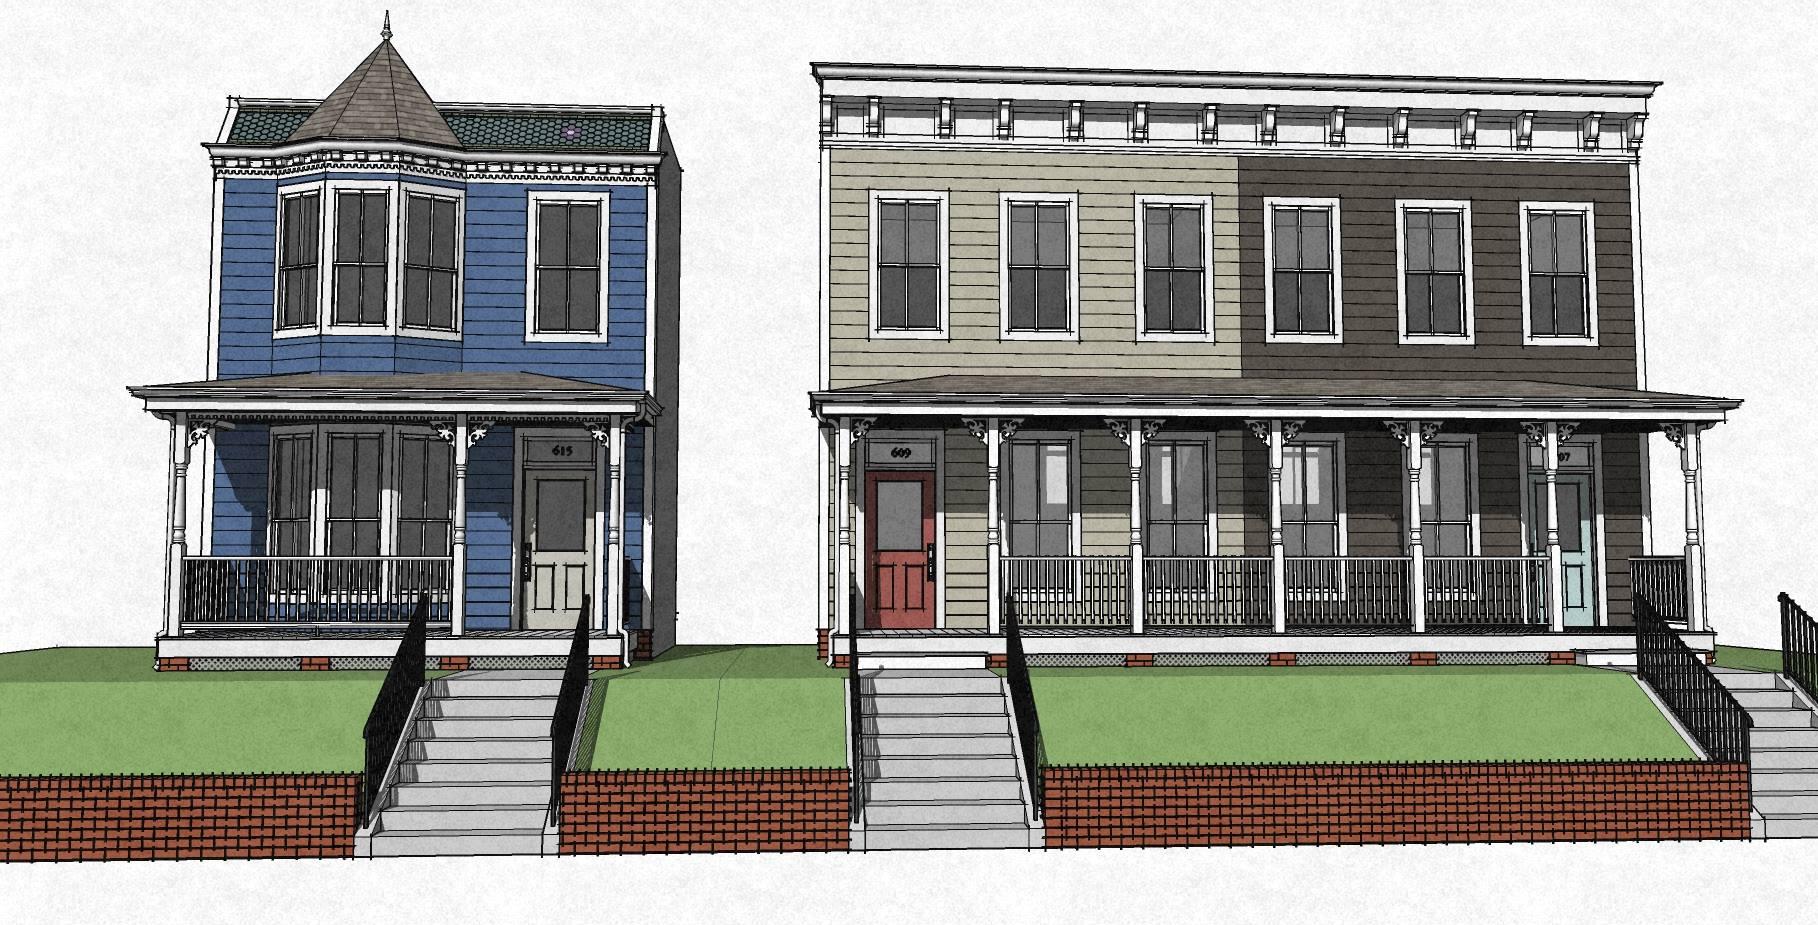 600 block of North 29th Street